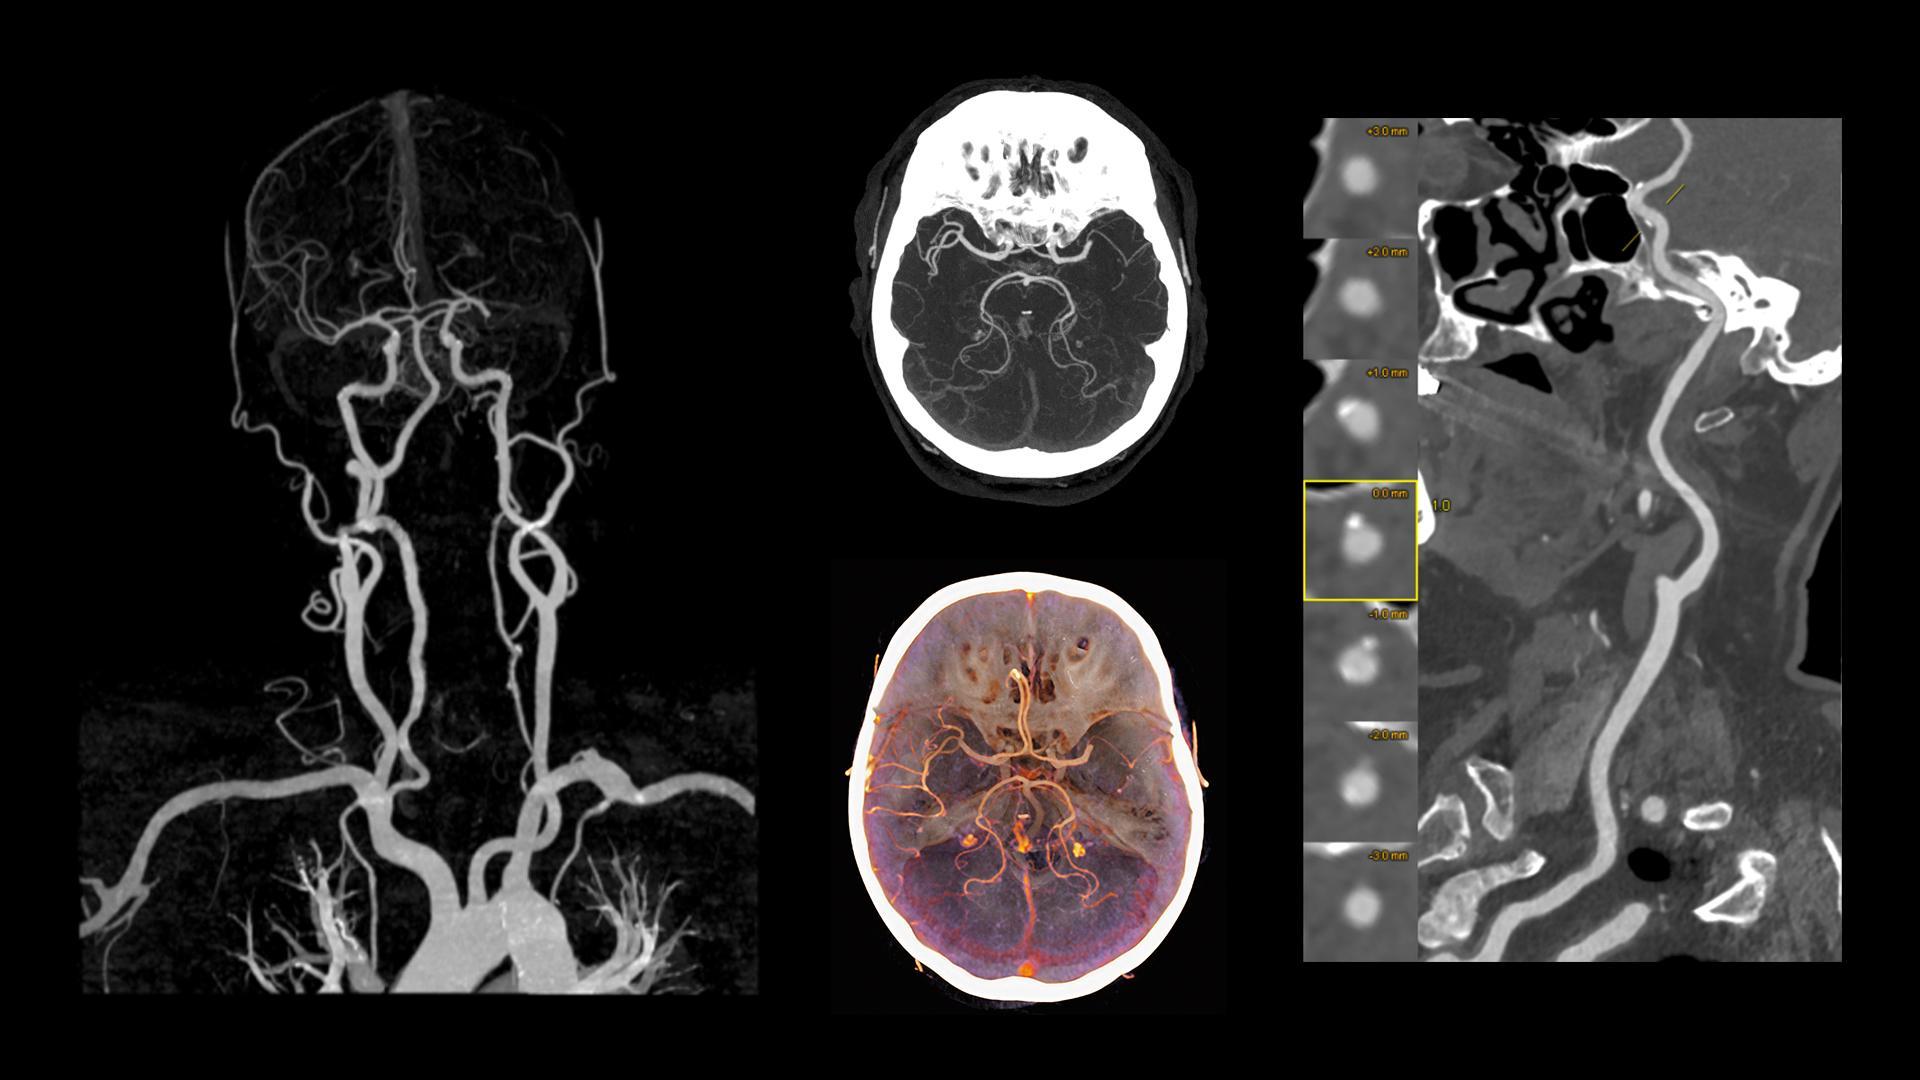 Supra-aortic CTA for clot assessment